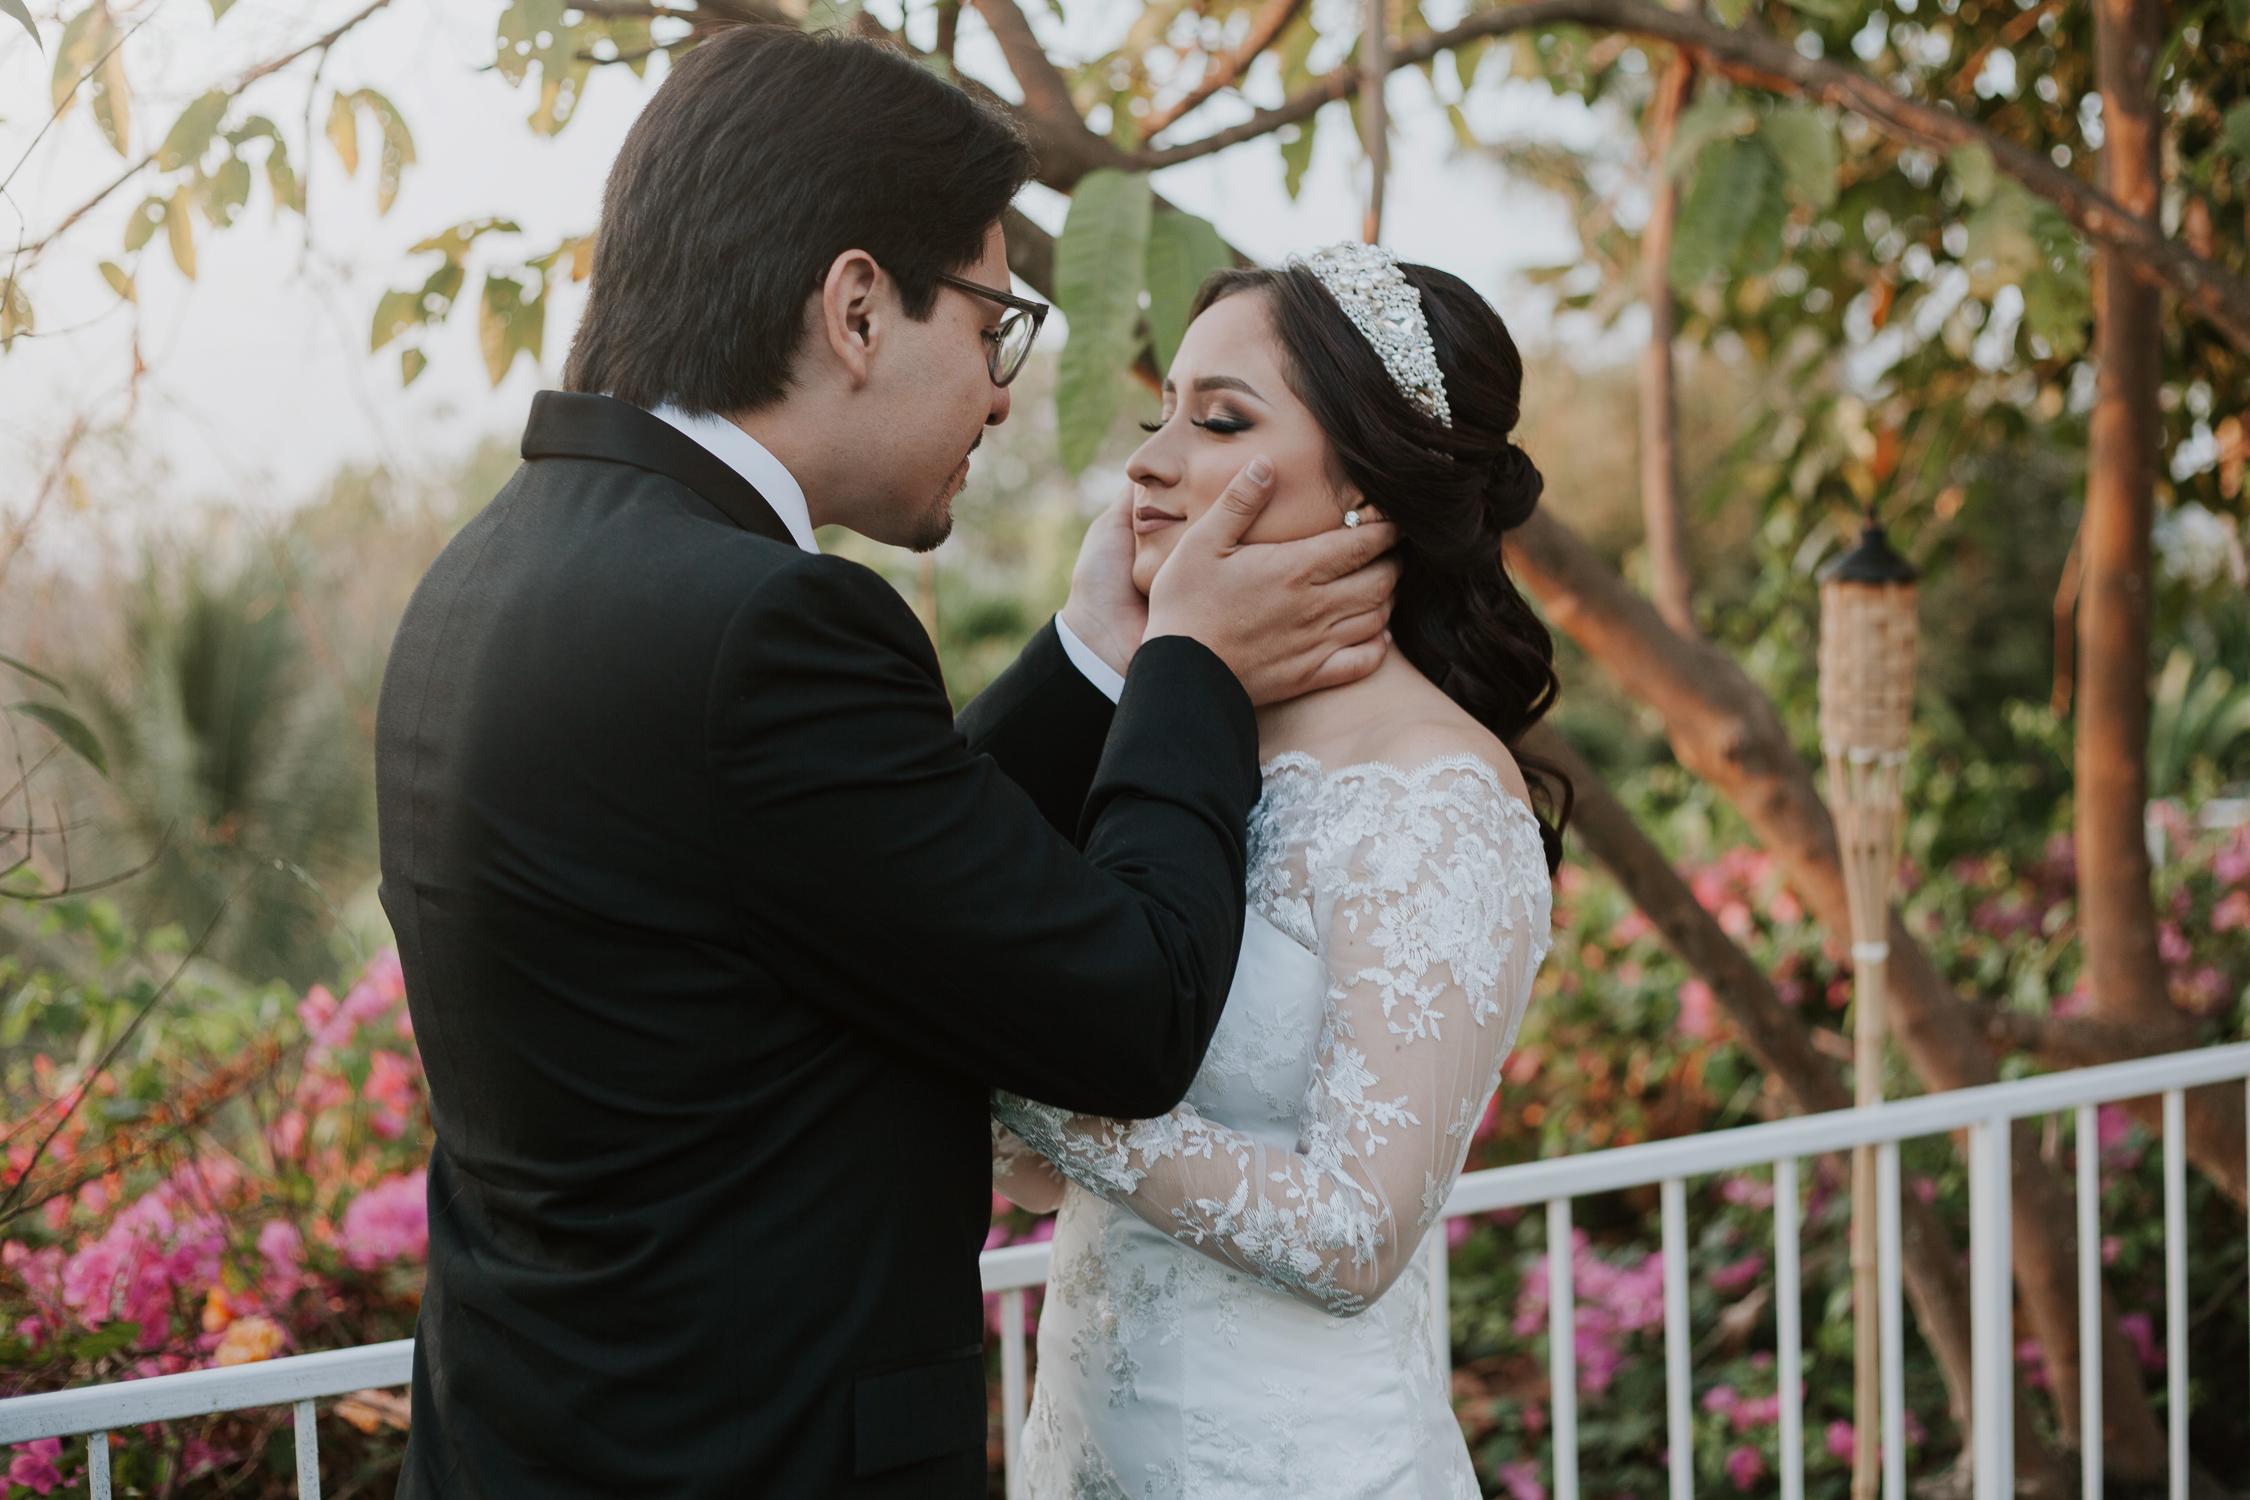 Michelle-Agurto-Fotografia-Bodas-Ecuador-Destination-Wedding-Photographer-Pauli-Edwin-14.JPG